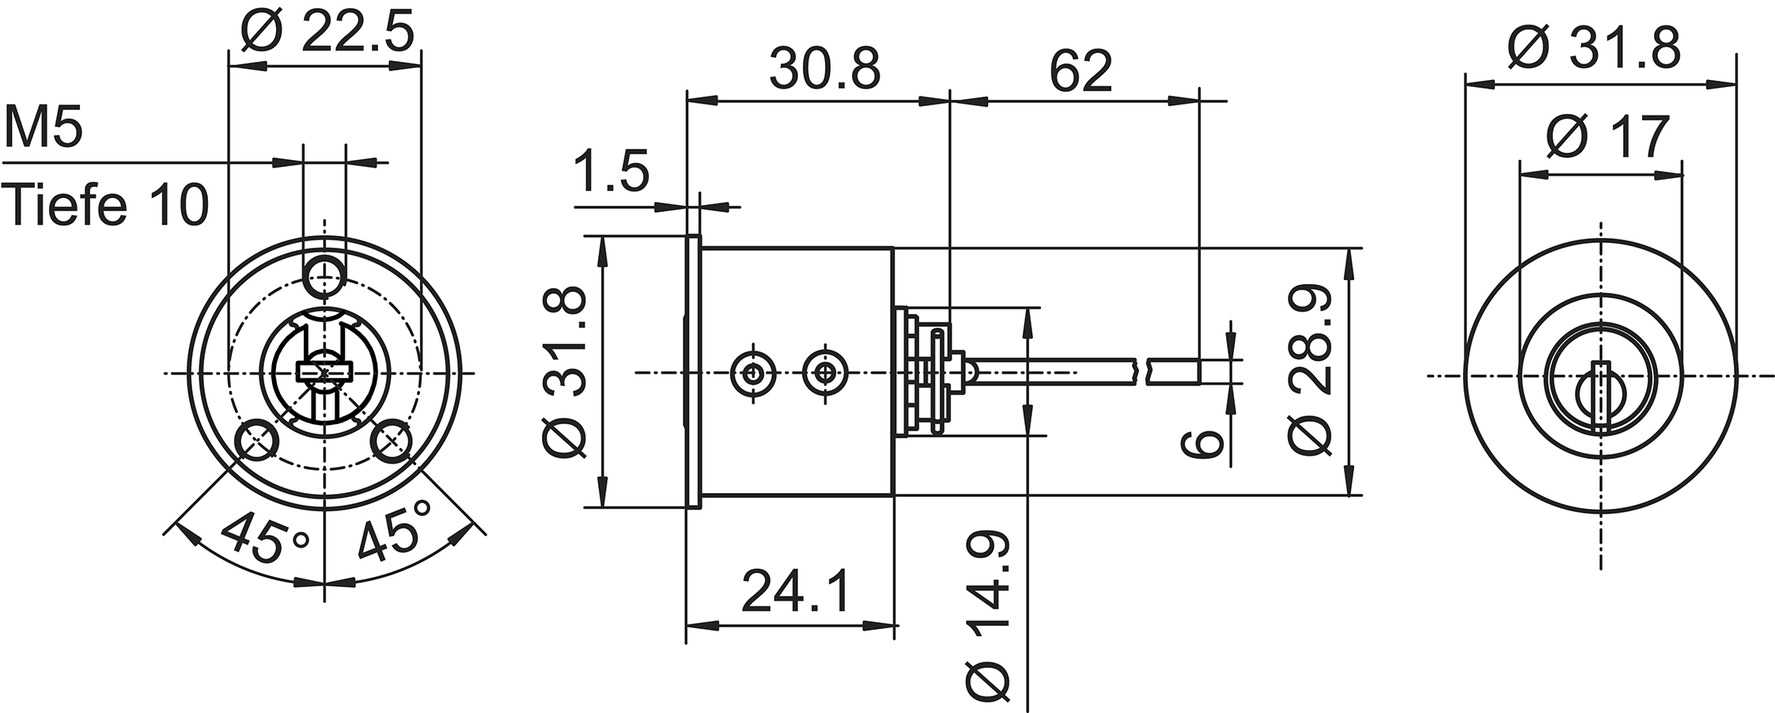 Cylindres extérieurs Kaba star type M1007